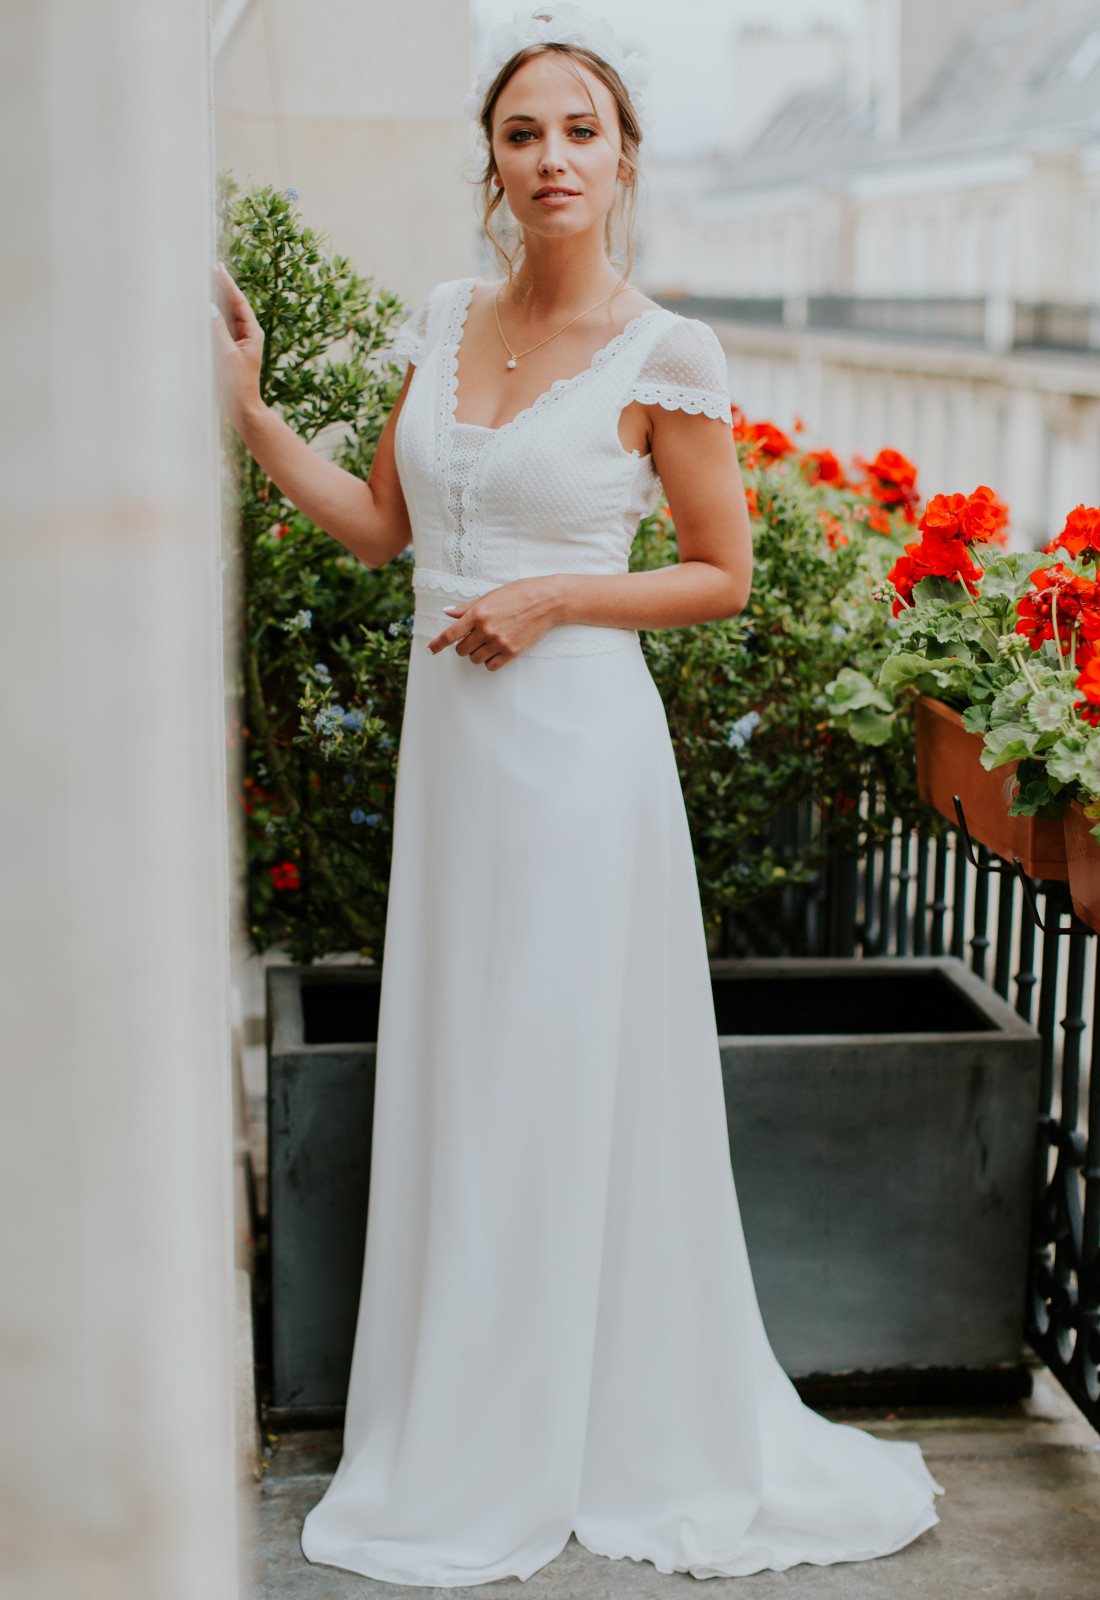 Robe De Mariee Boheme Florence Elsa Gary Fluide A Plumetis A Toulon